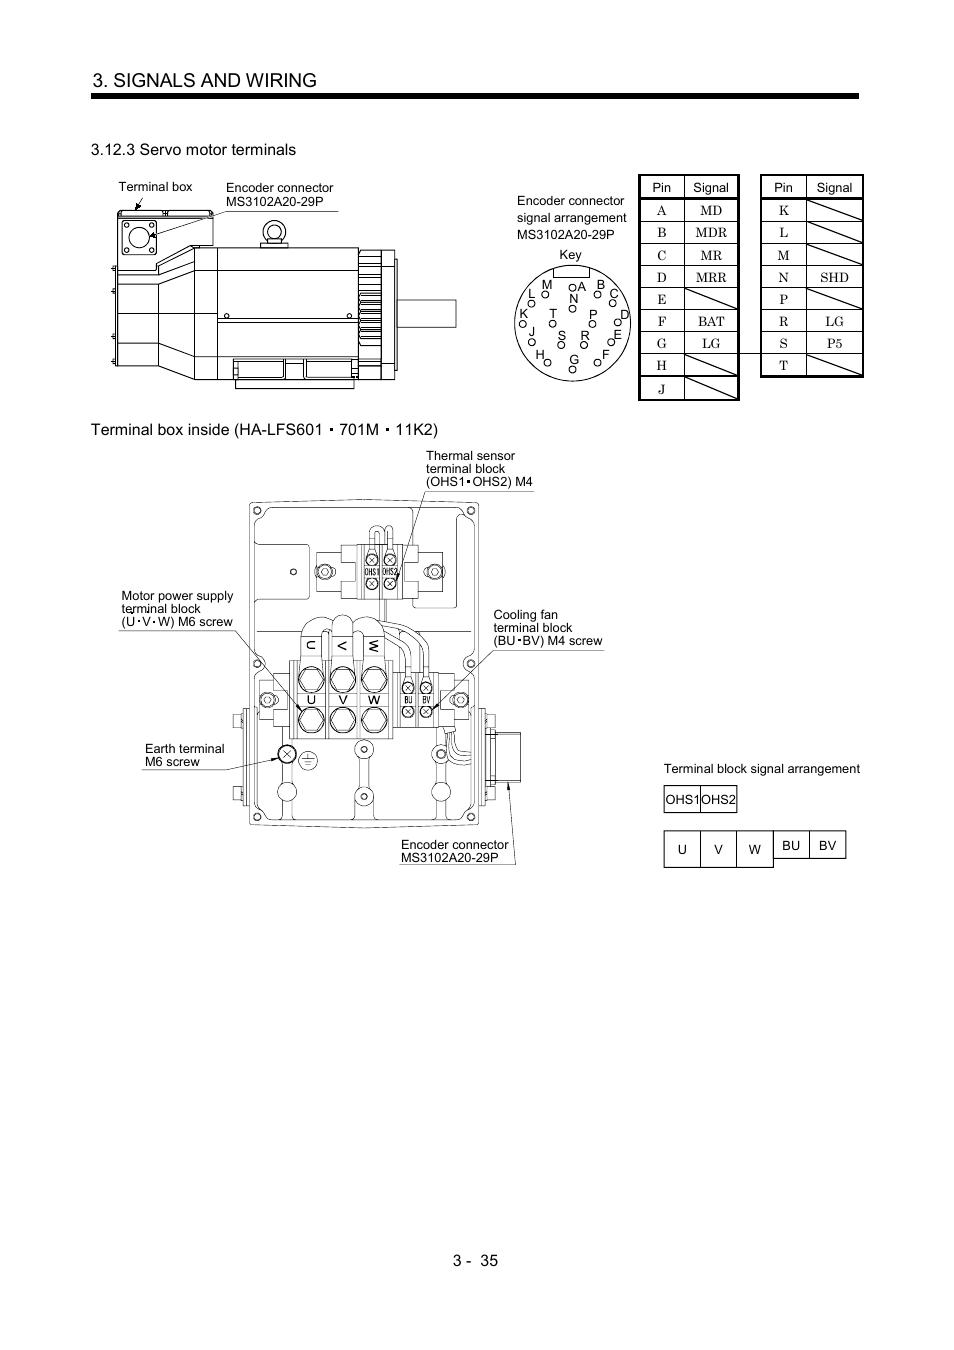 3 Servo Motor Terminals Signals And Wiring Mitsubishi Electric Merservo Mr J2s B User Manual Page 78 236